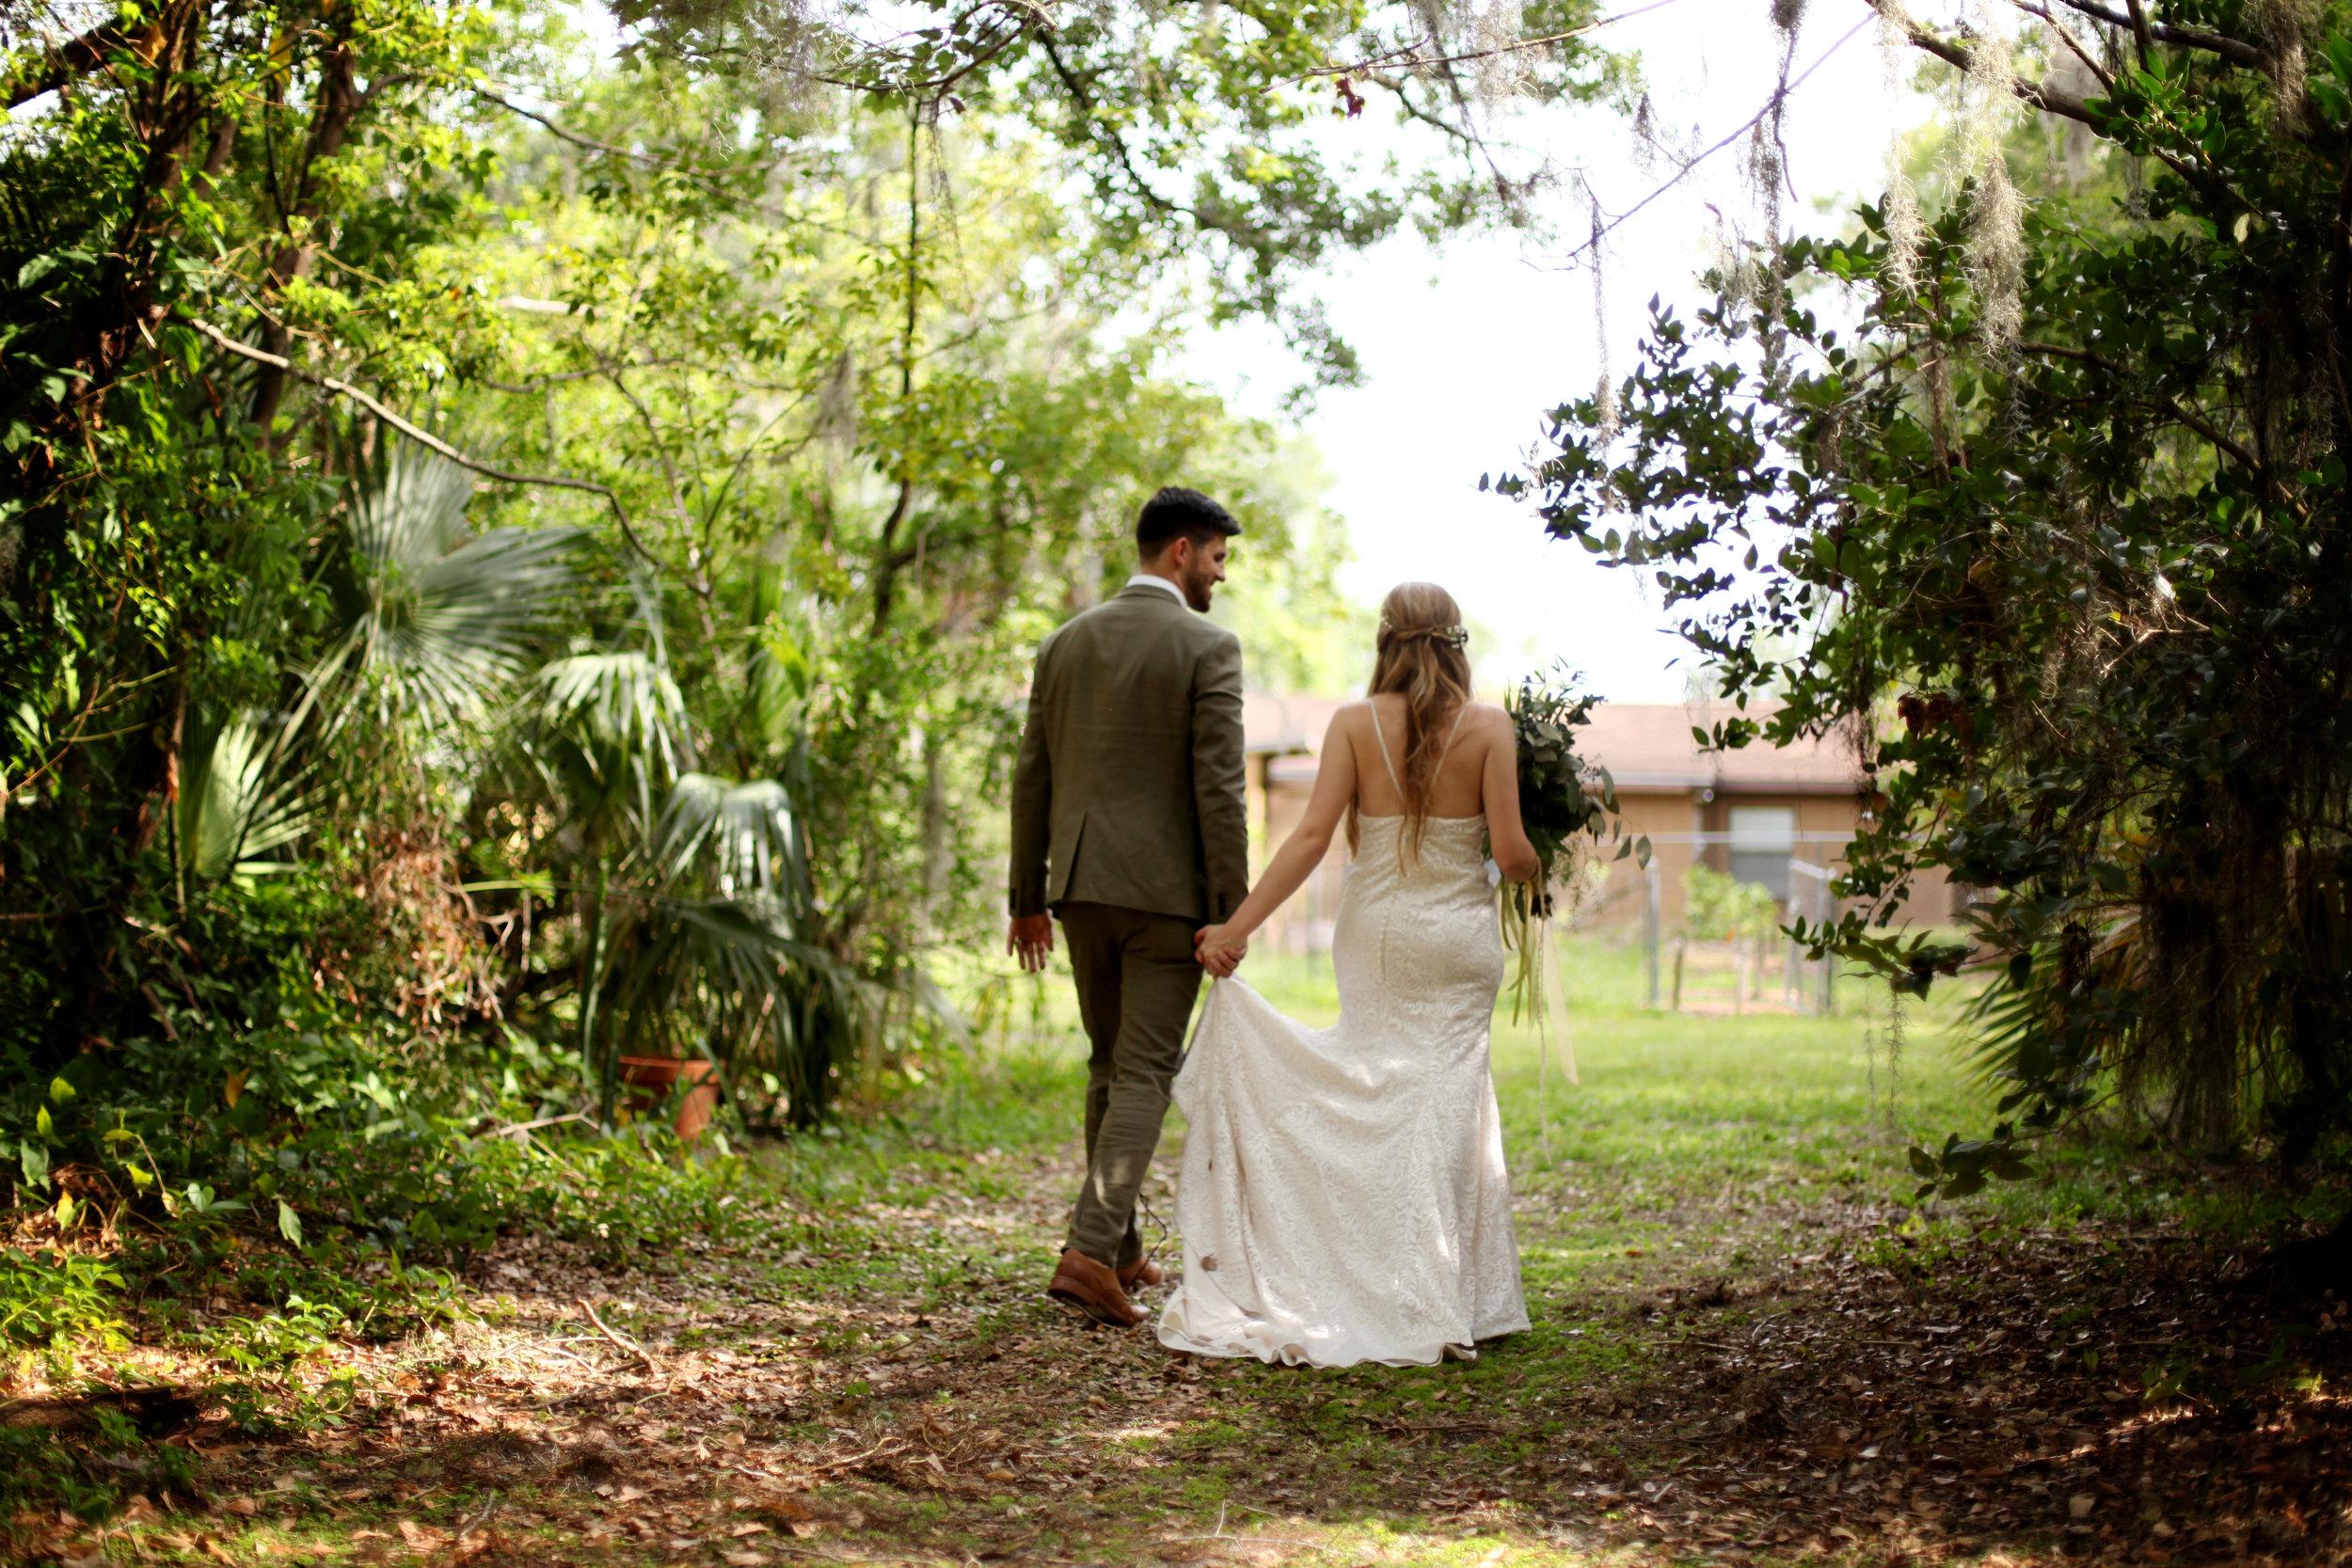 Walking through a magical Florida forest